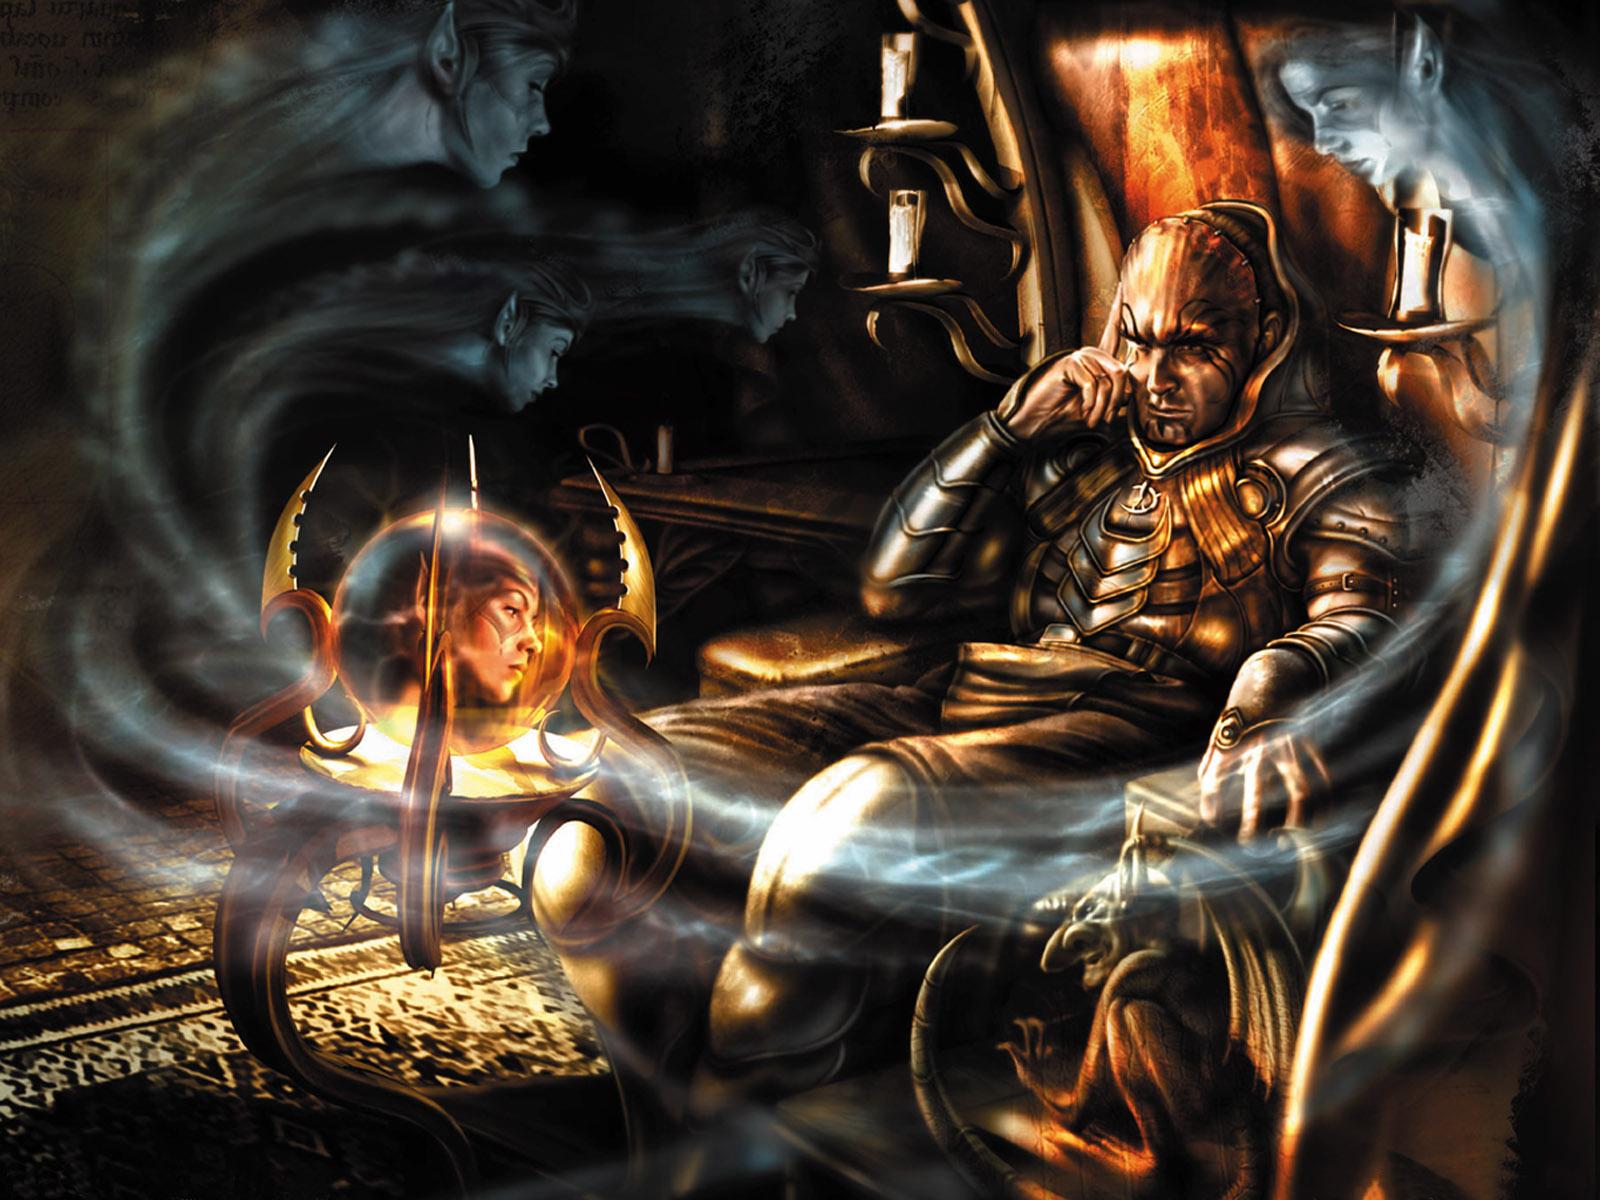 Fondos De Pantalla Baldurs Gate Baldurs Gate 2 Shadows Of